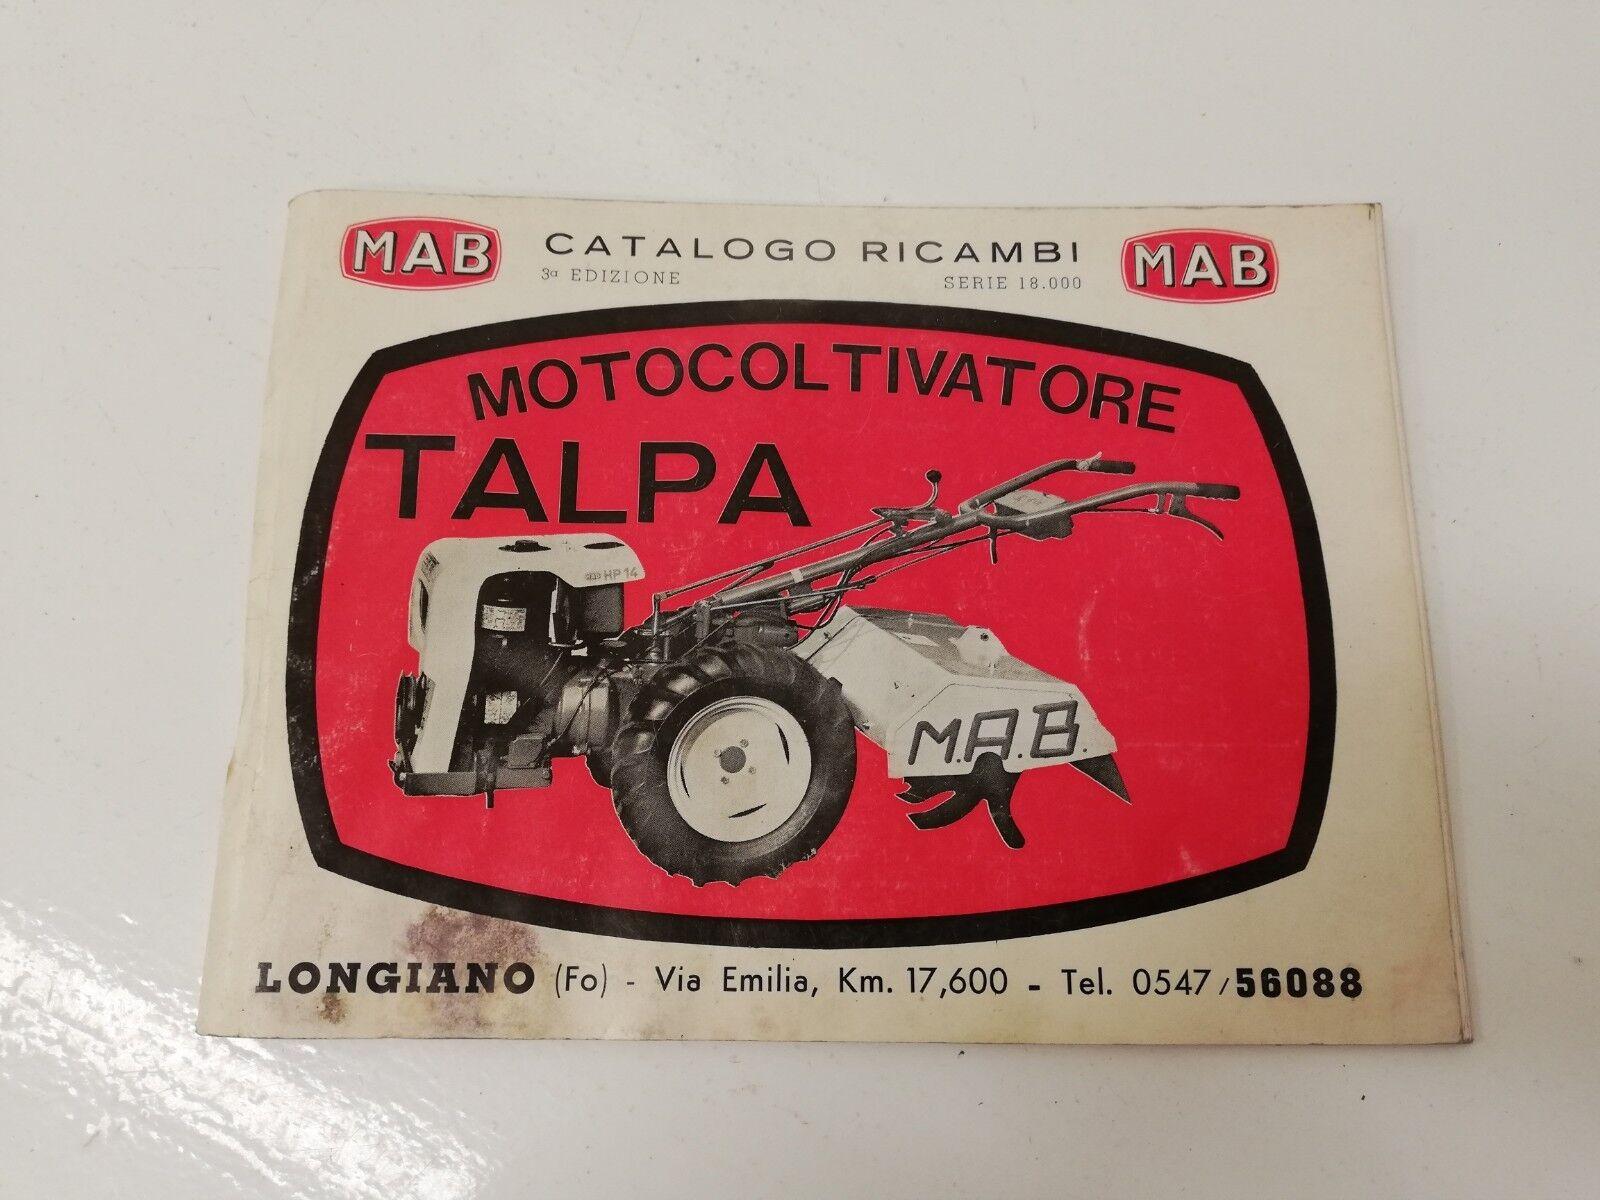 Manuale manual libretto uso manutenzione ricambi parts MAB TALPA 3° ed.